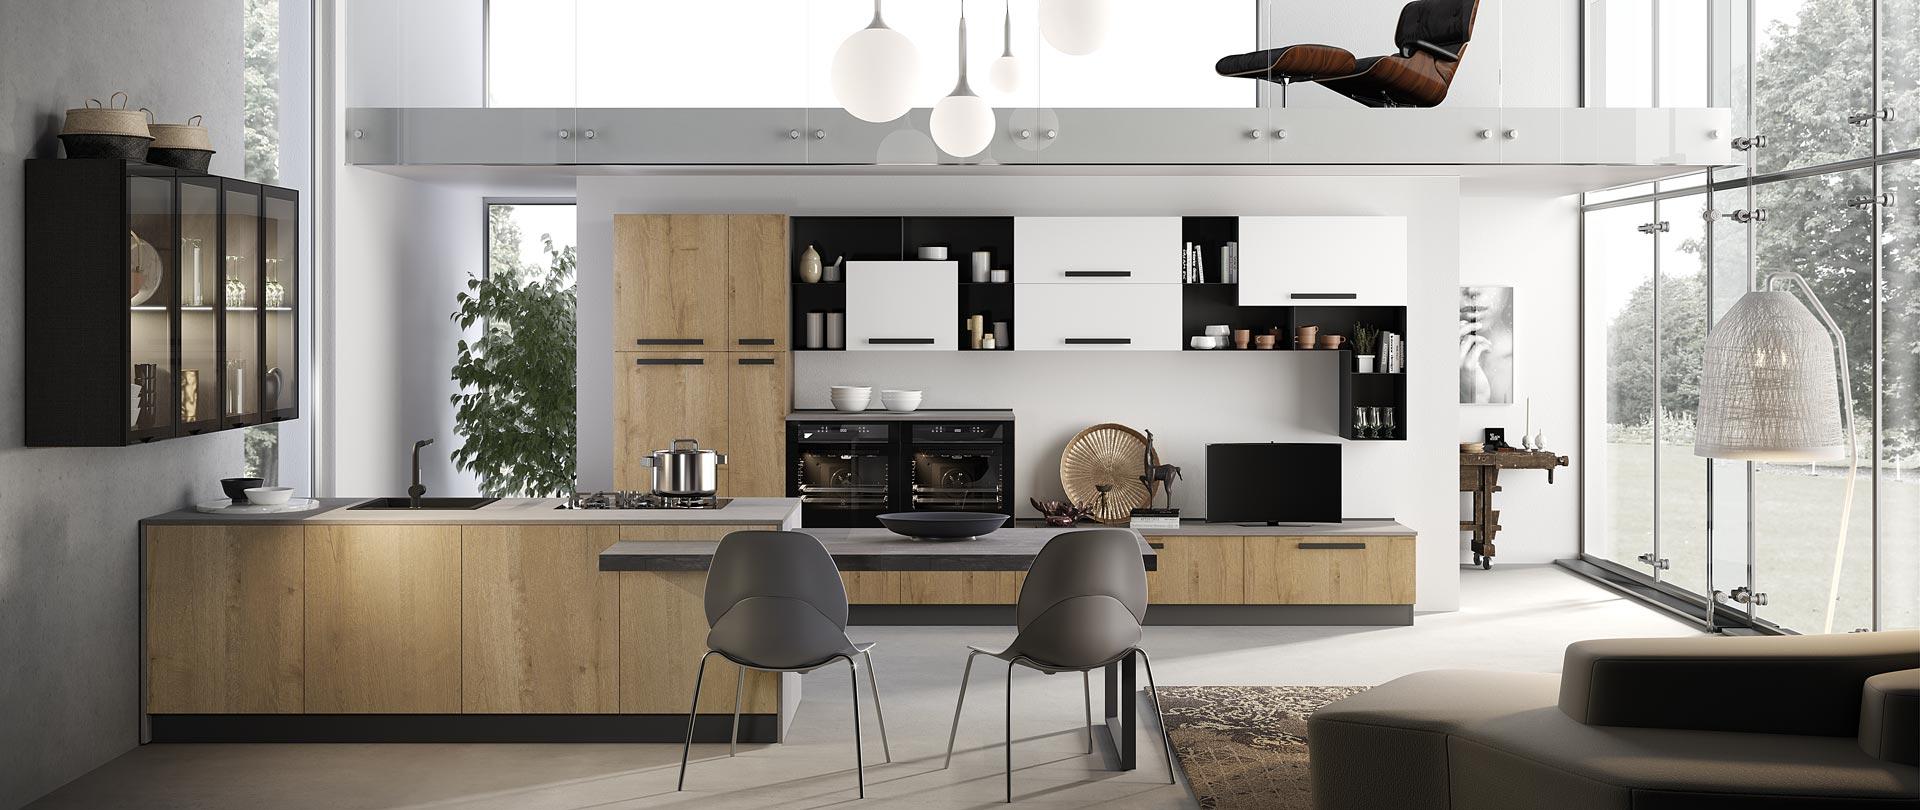 01-cucina-moderna-nala-rovere-savana